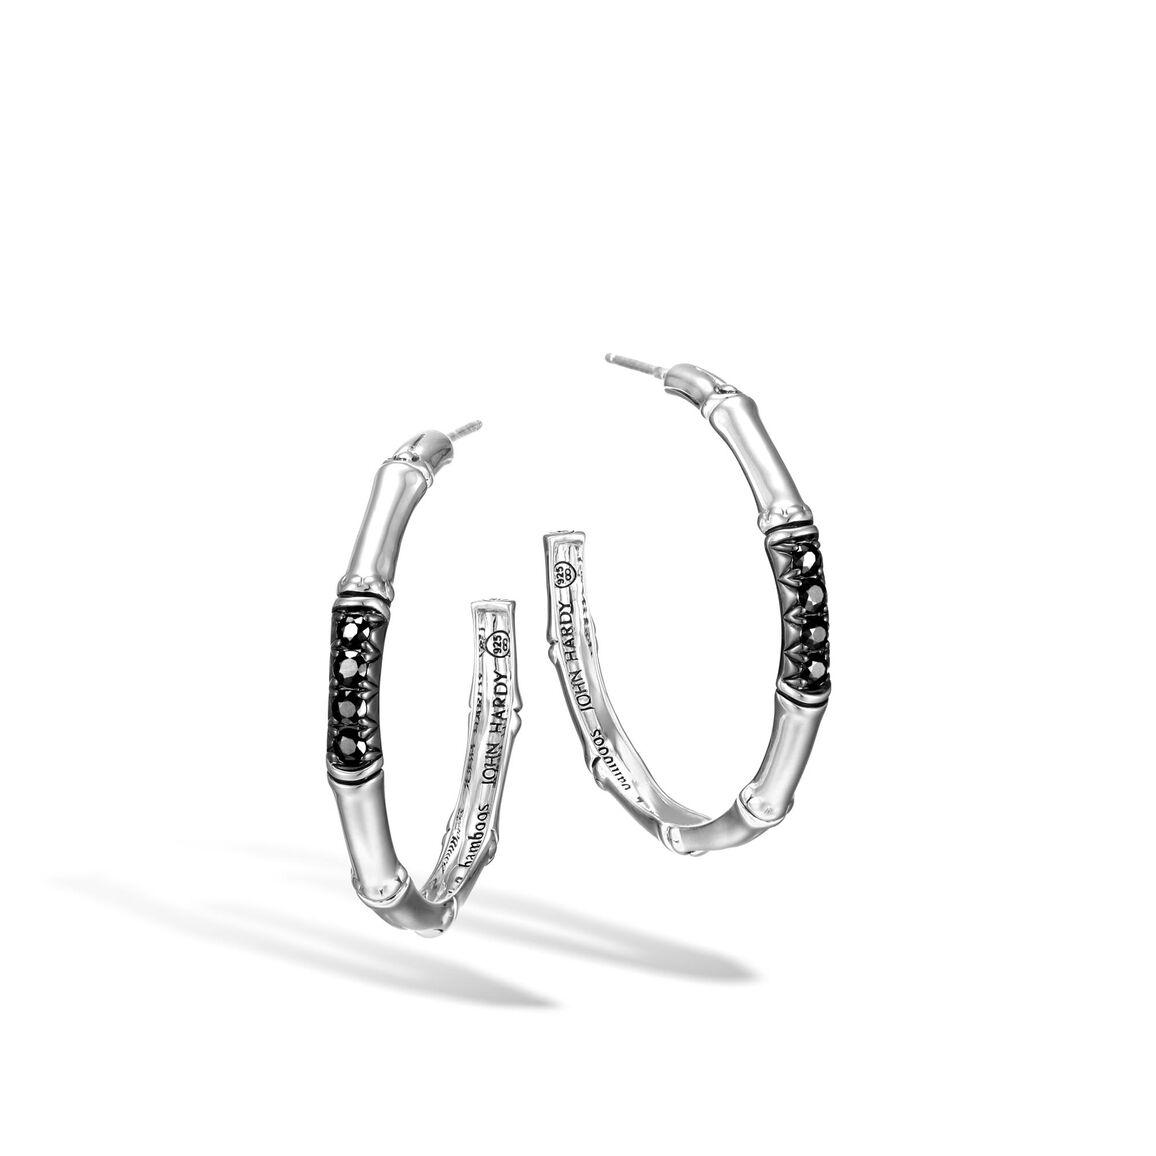 Bamboo Medium Hoop Earring in Silver with Gemstone